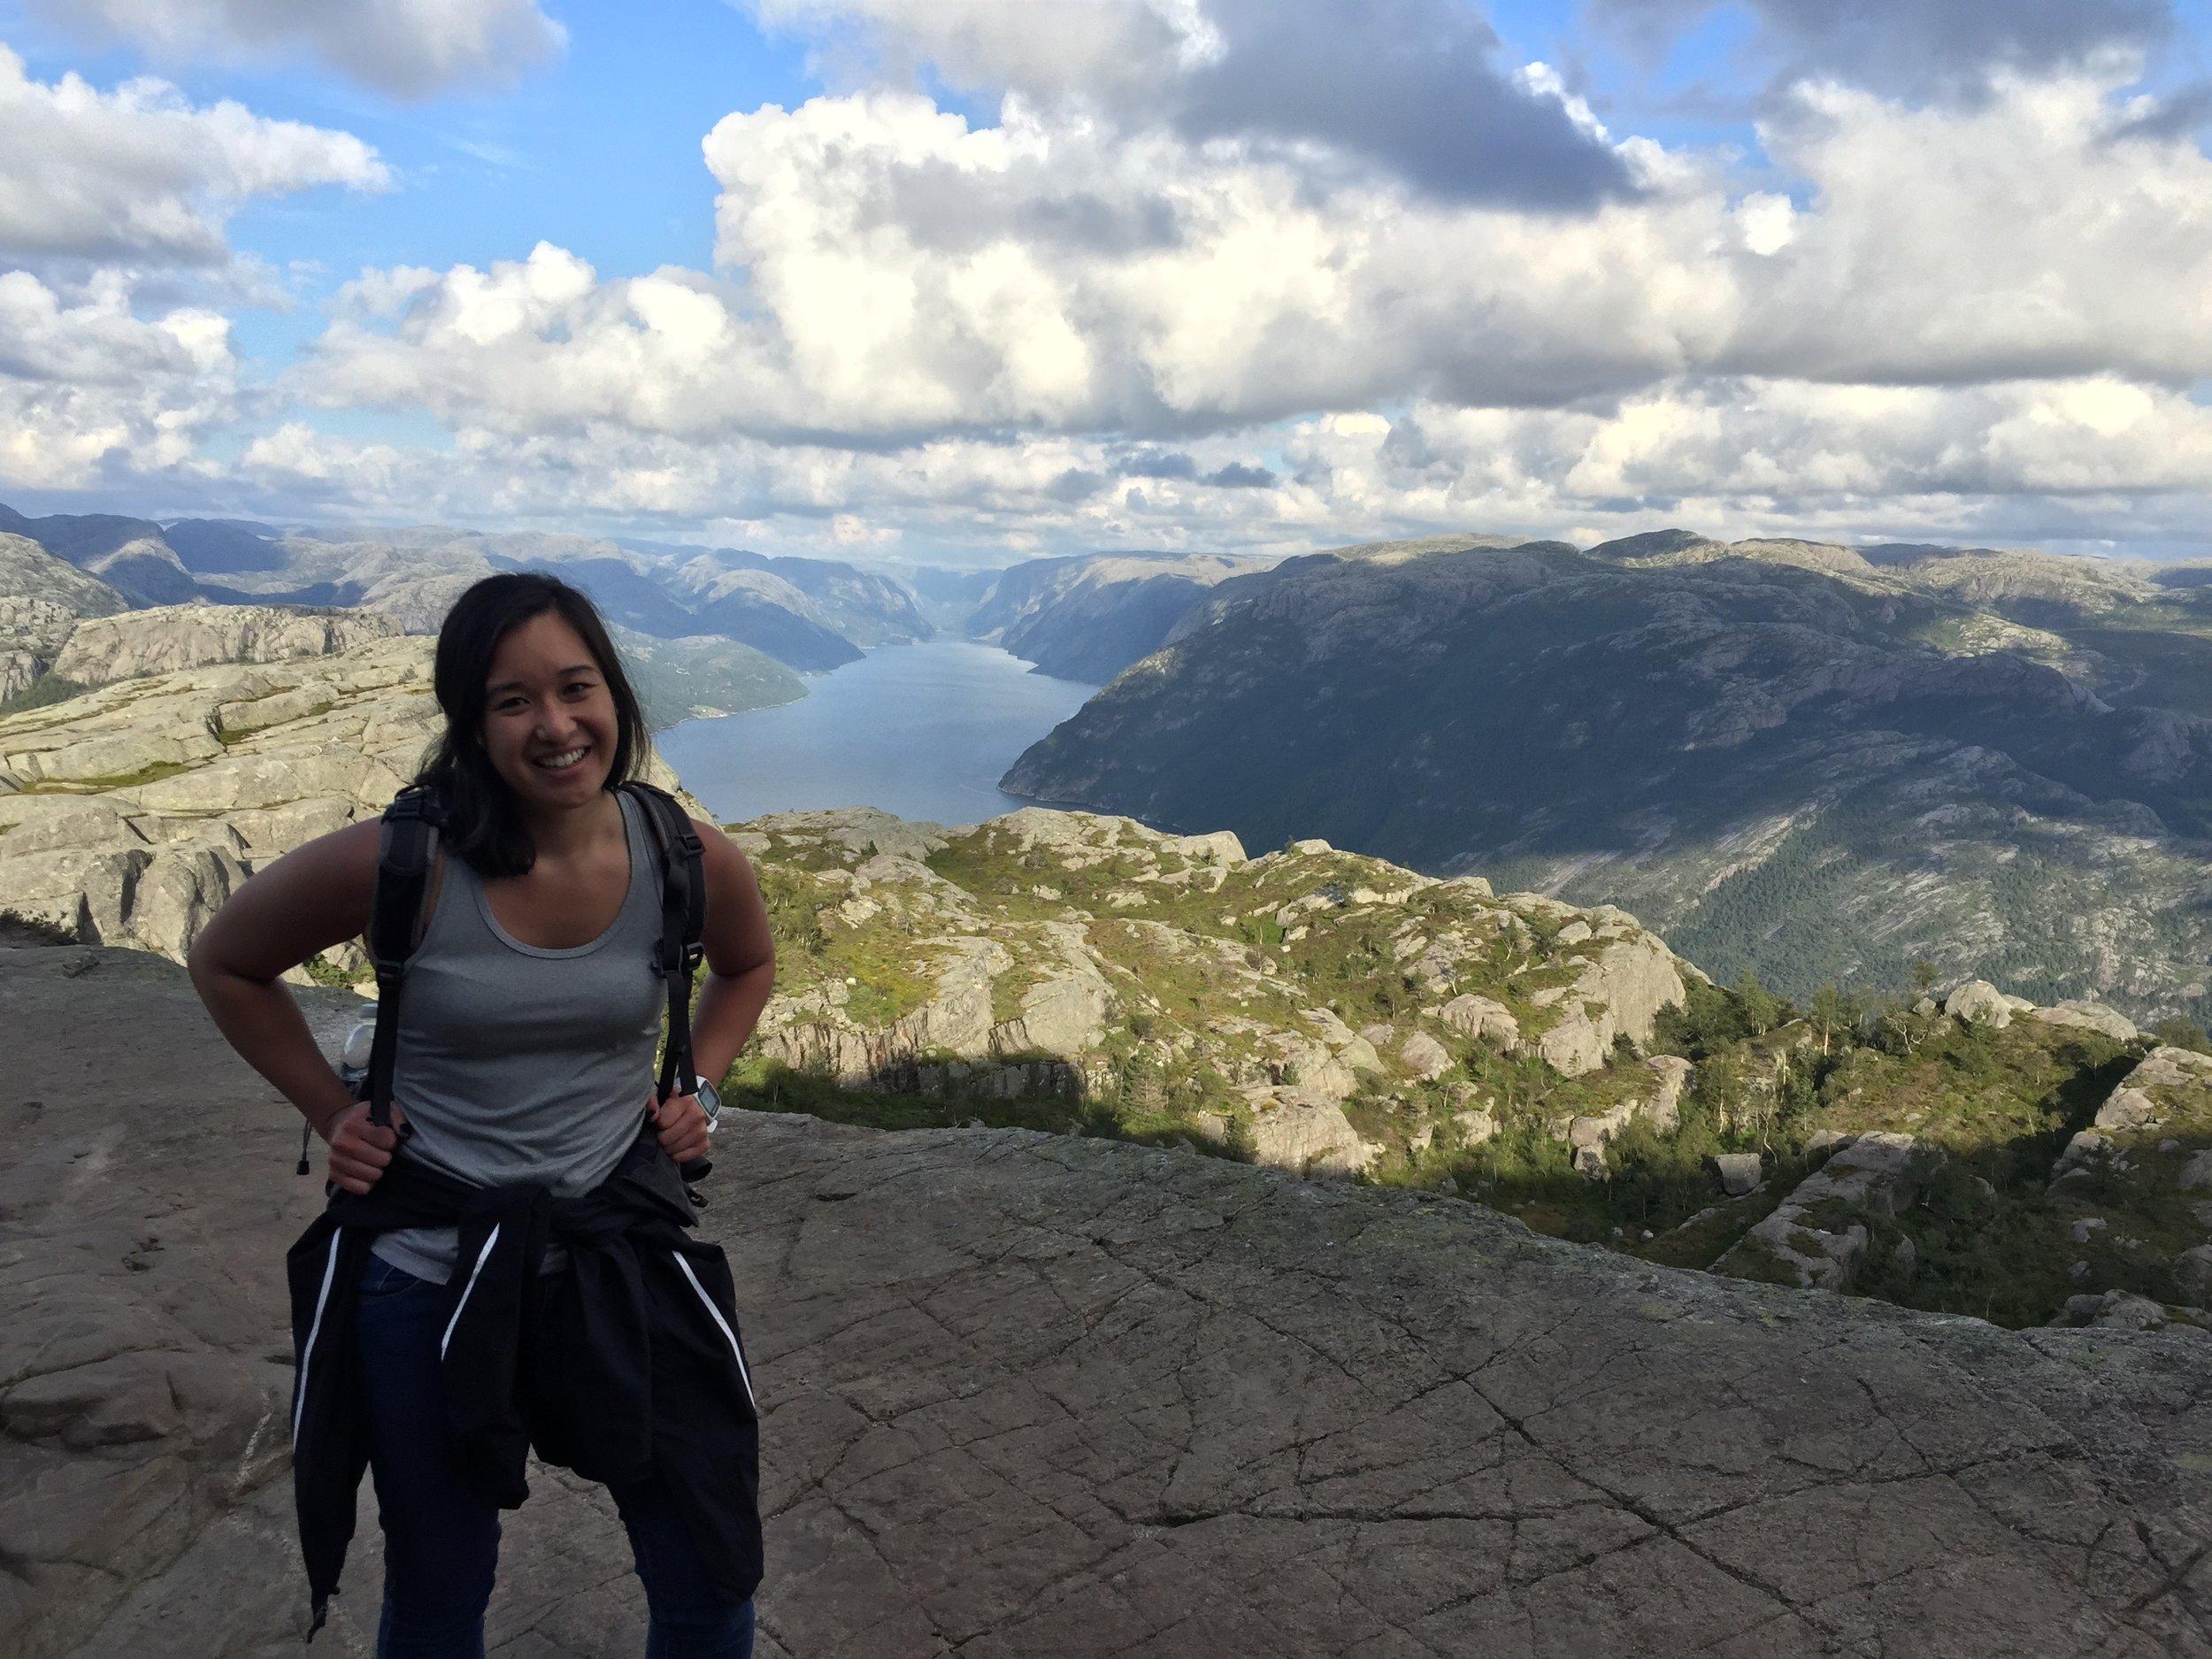 Hiking Preikestolen (Pulpit Rock) in Norway in August, 2015